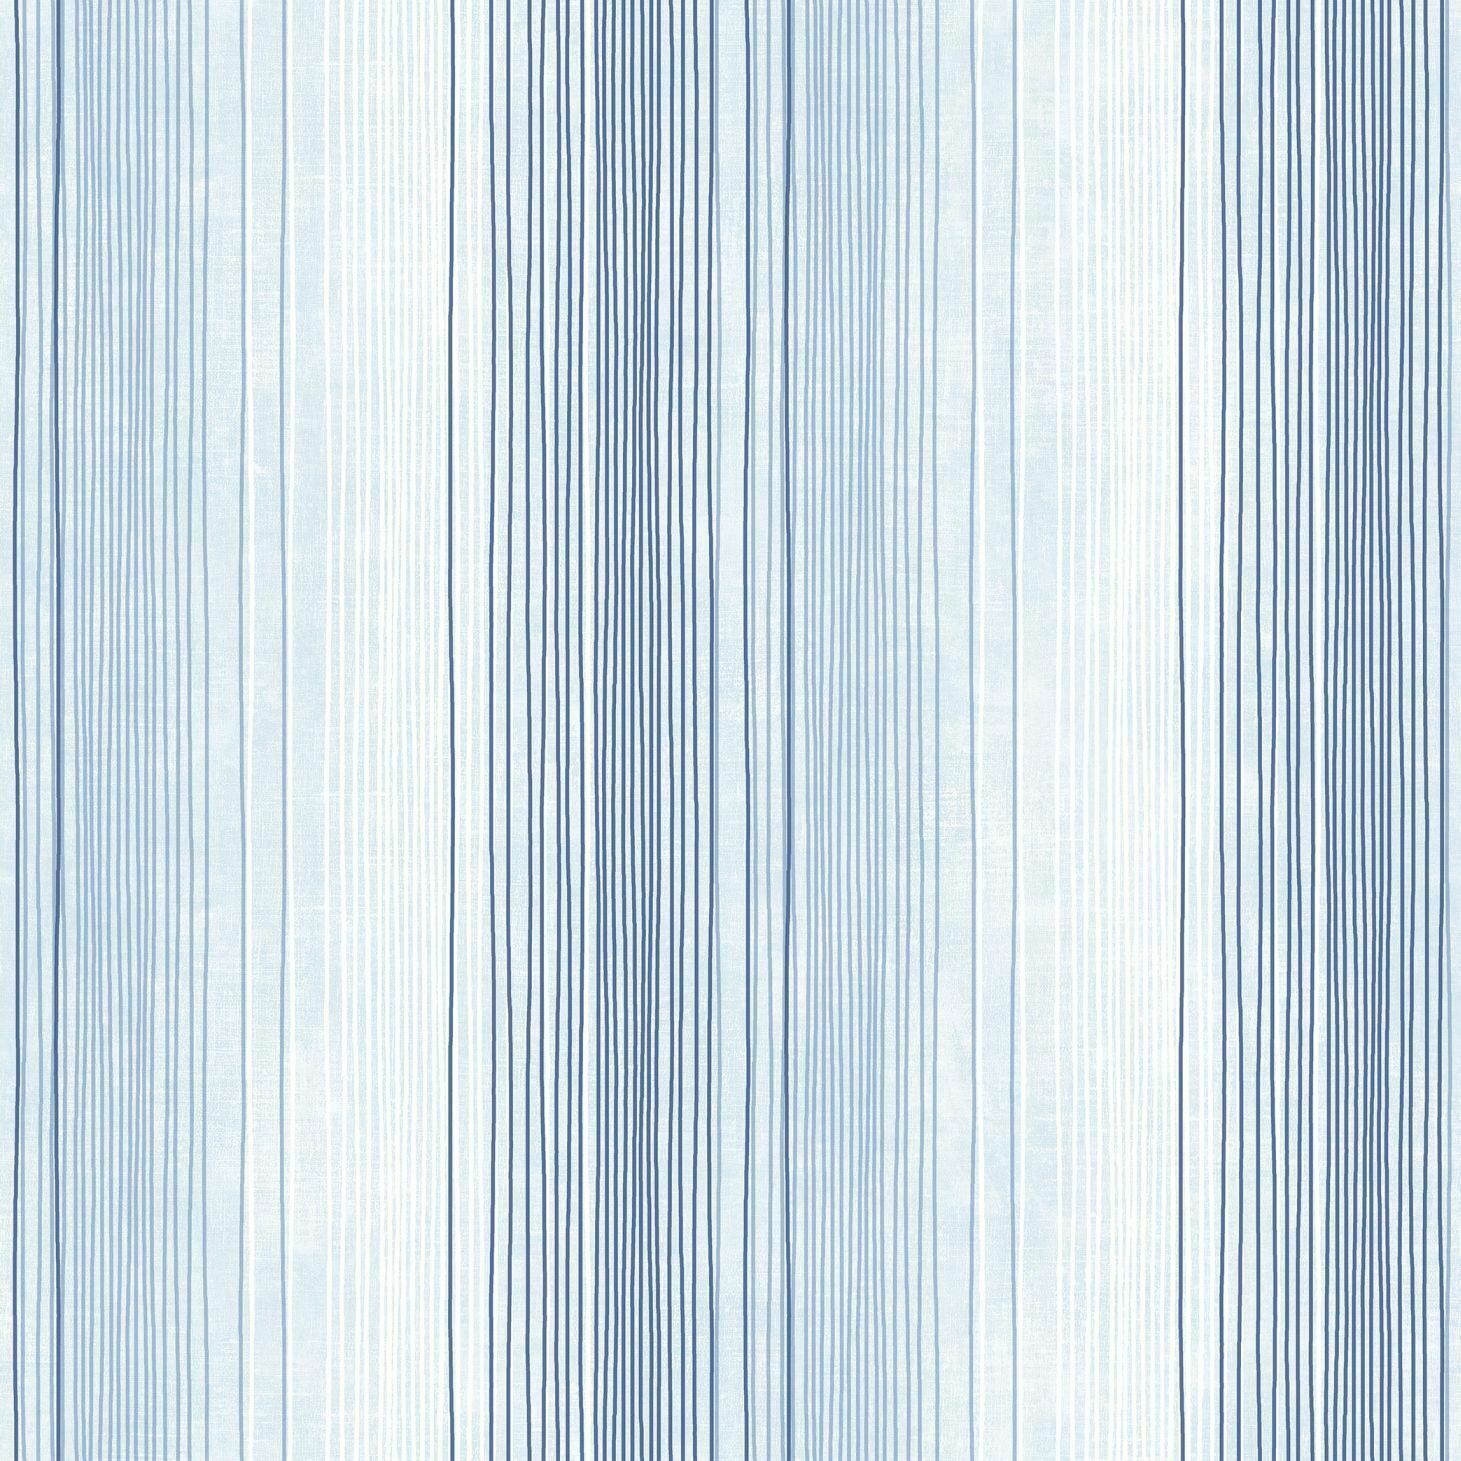 Essener Tapete Simply Stripes 3 ST36920 hellblue Streifen gestreift Vinyltapete